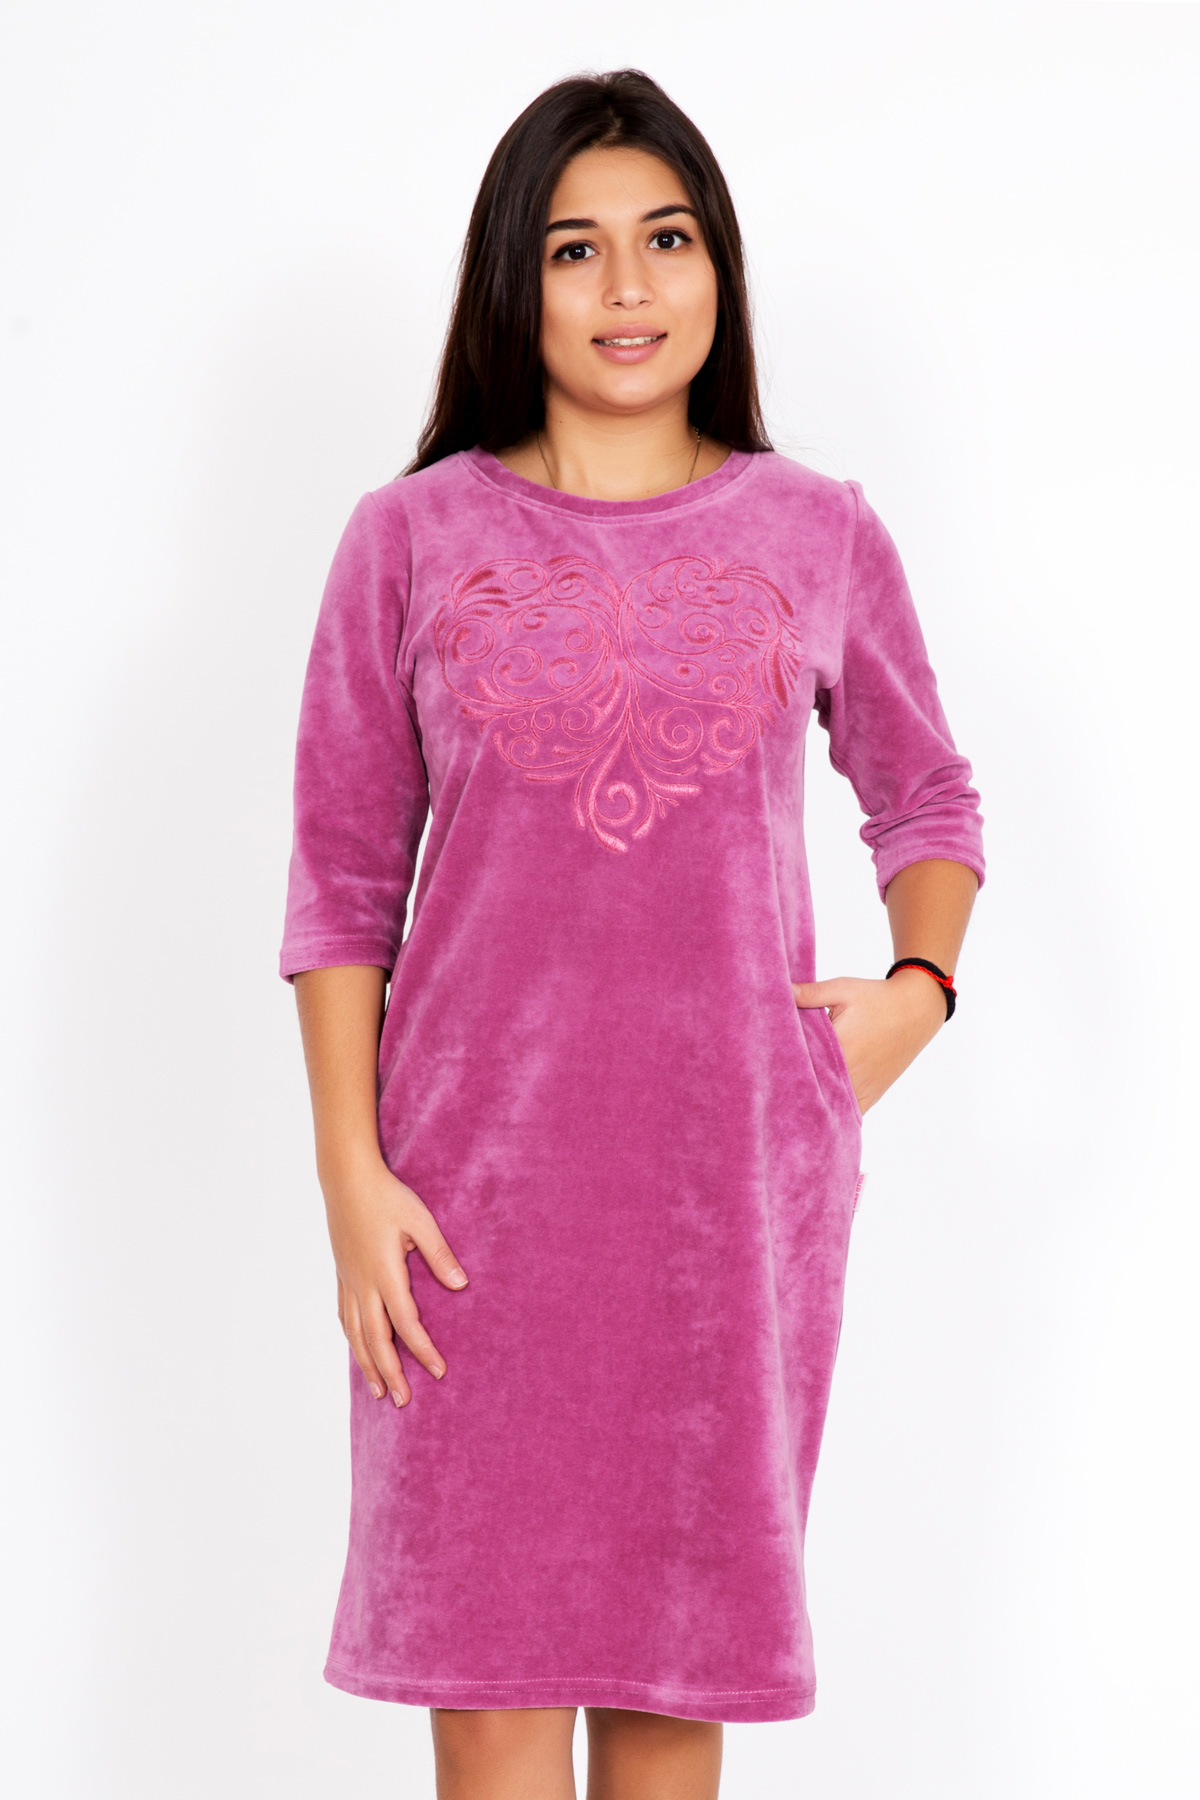 Жен. платье Аврелия р. 54Платья<br>Факт. ОГ: 110 см <br>Факт. ОТ: 104 см <br>Факт. ОБ: 112 см <br>Длина по спинке: 96 см<br><br>Тип: Жен. платье<br>Размер: 54<br>Материал: Велюр